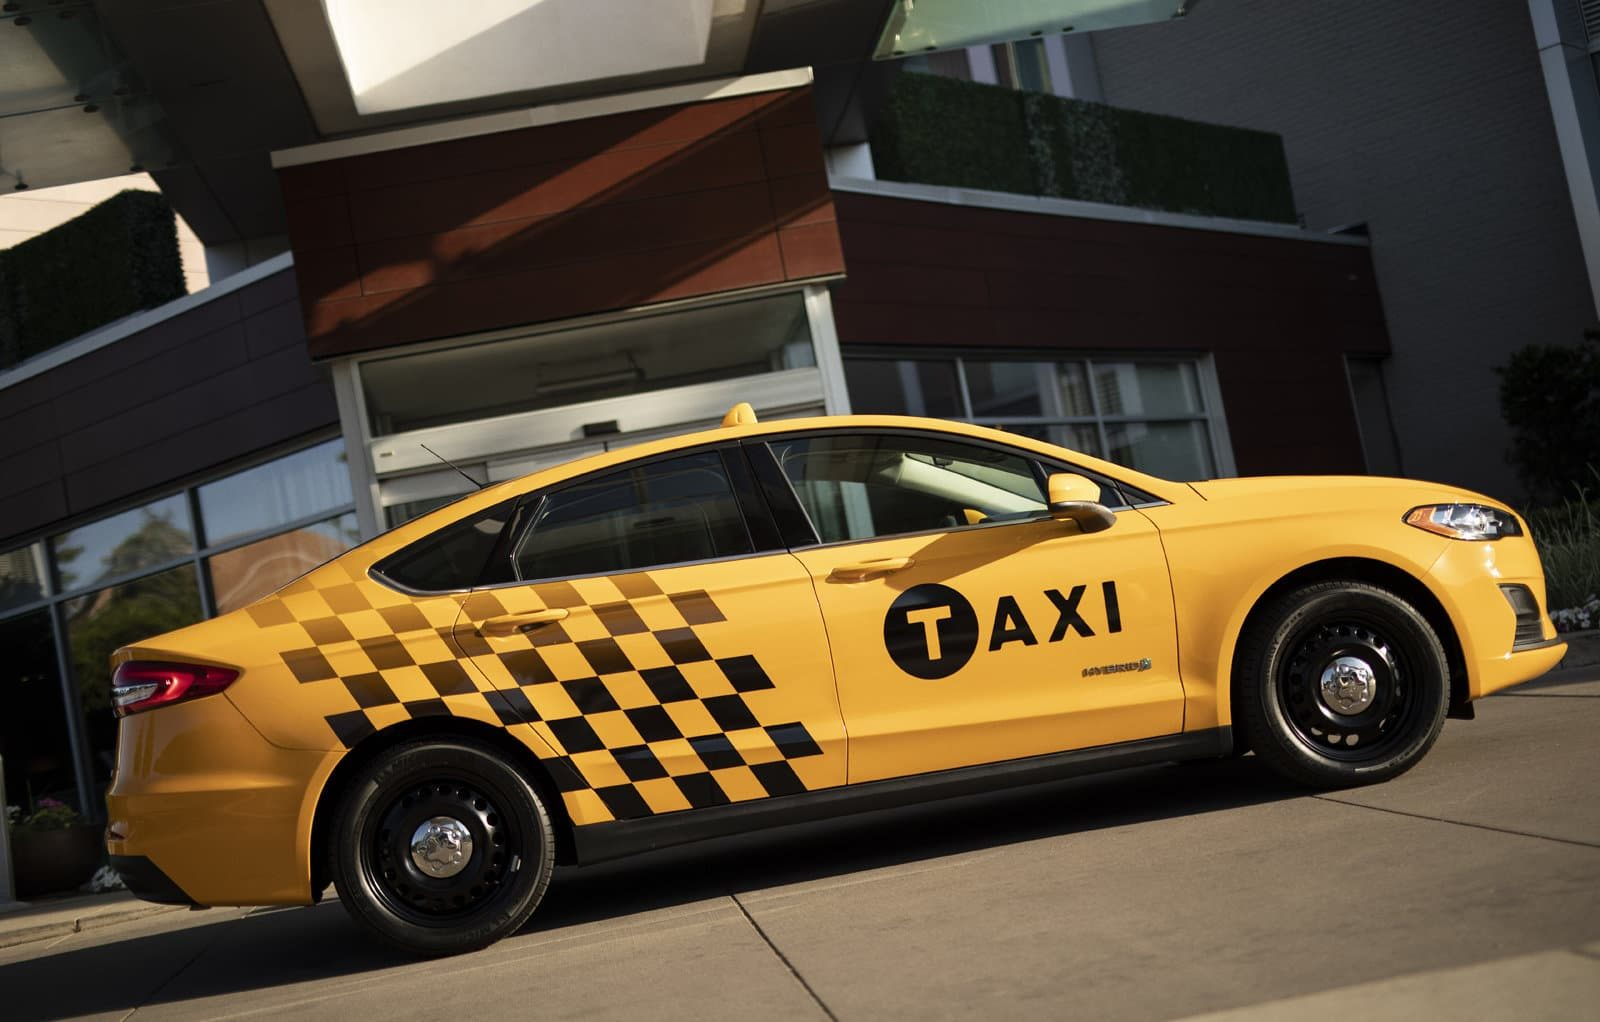 2019 Fusion Hybrid Taxi